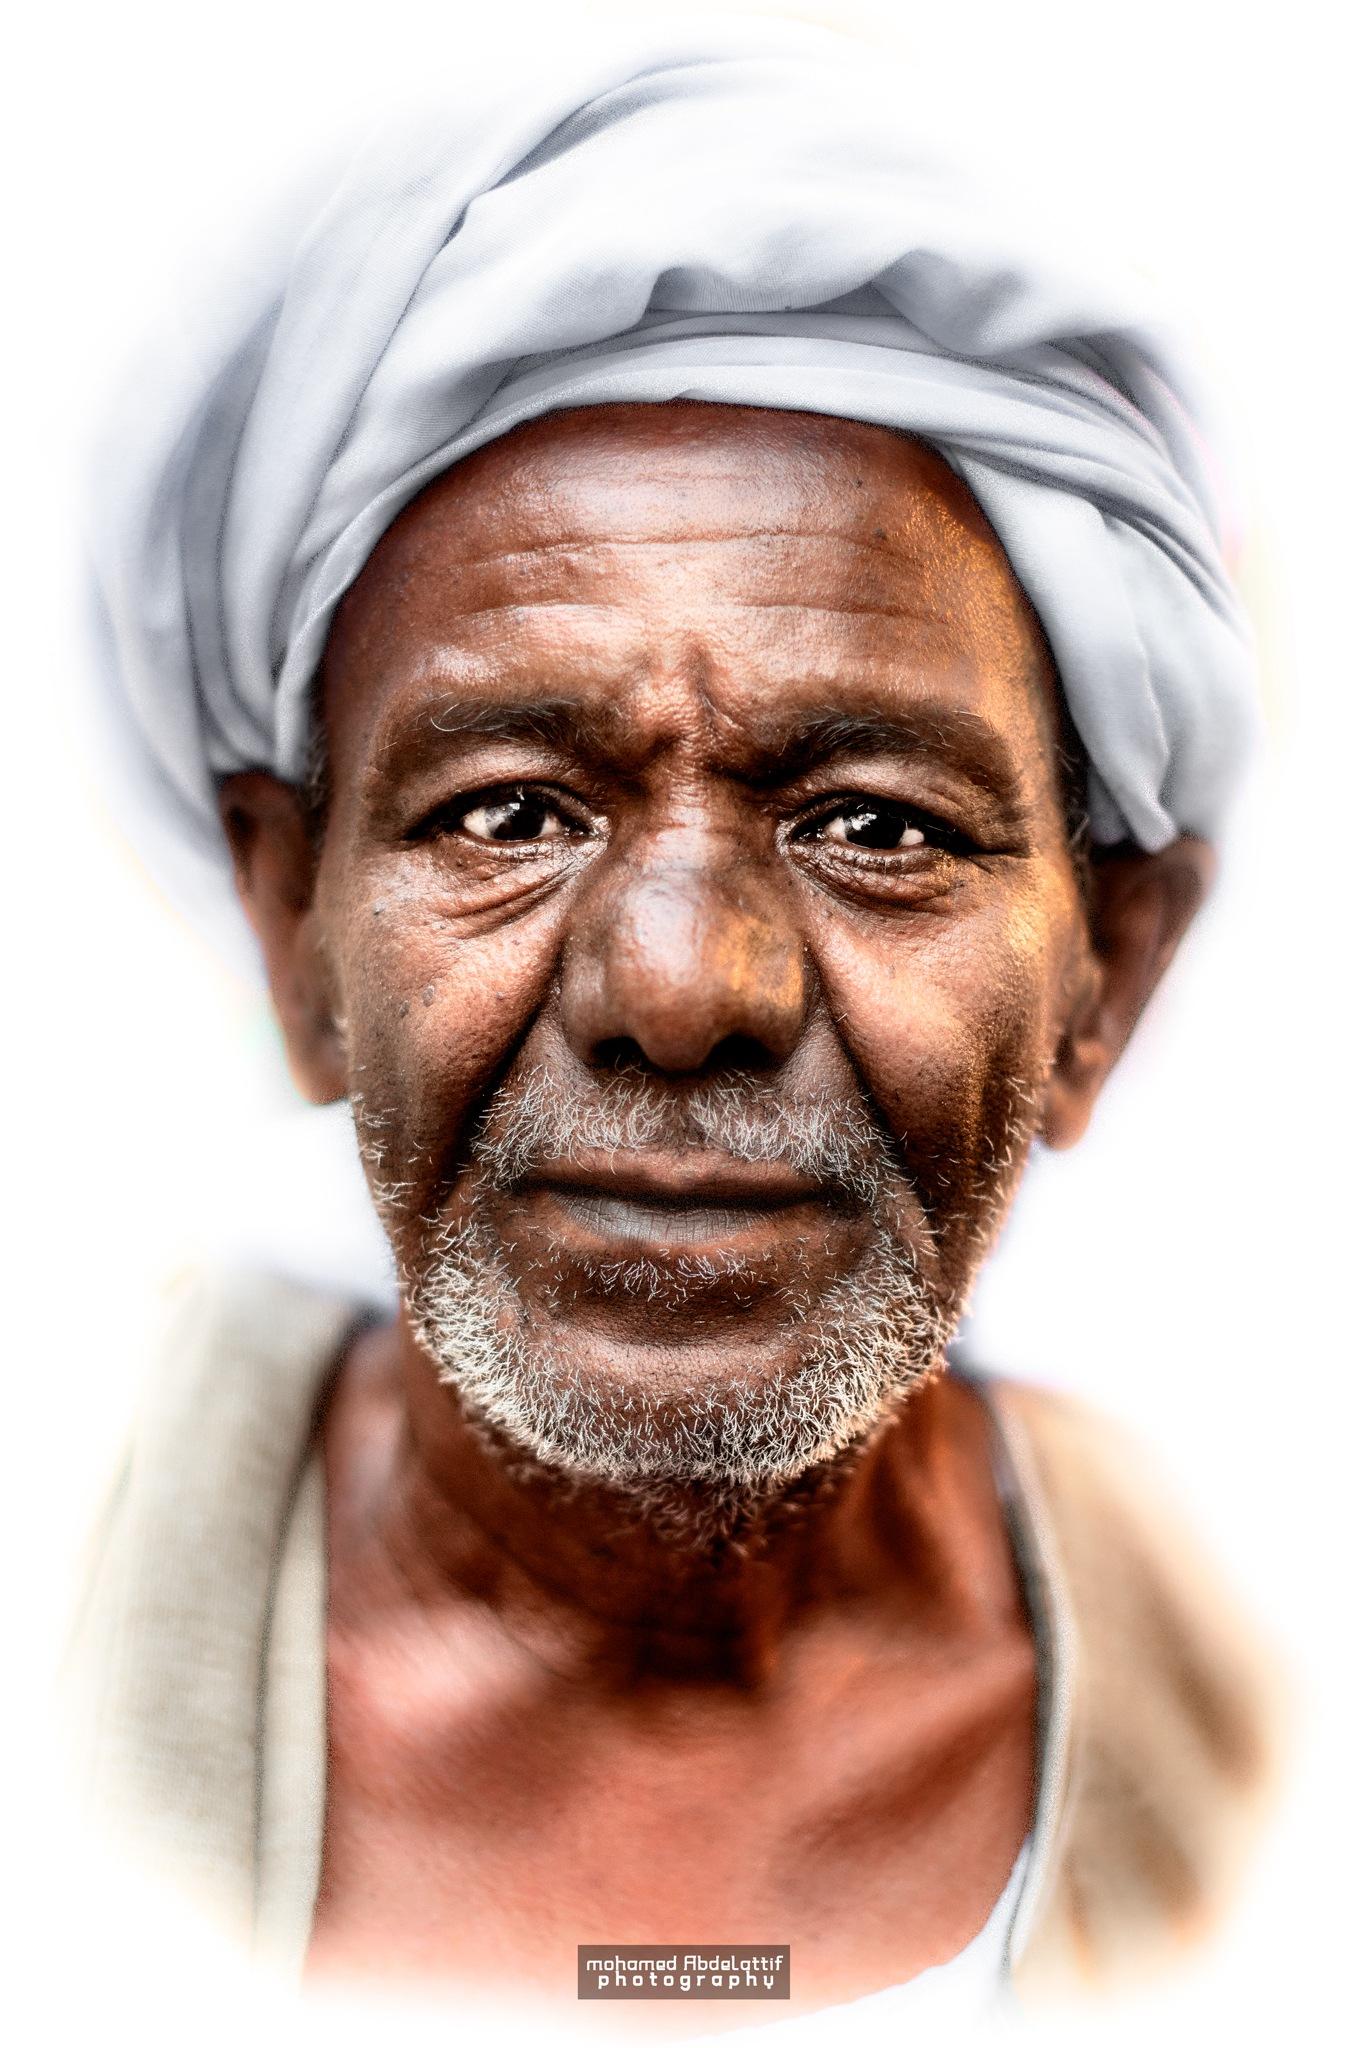 Untitled by Mohamed abdelattif aboelmagd Mahmoud